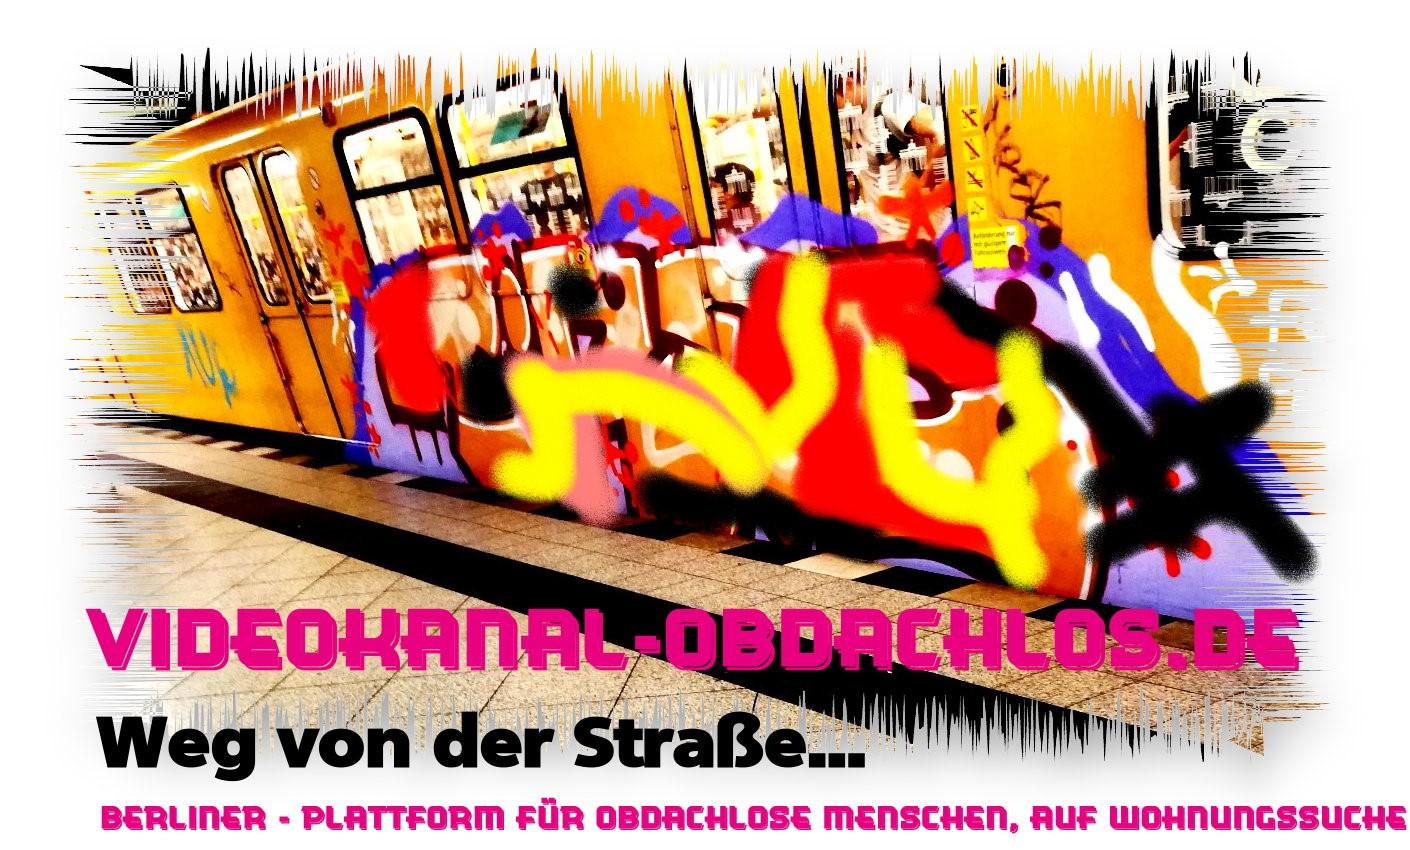 videokanal-obdachlos-berlin